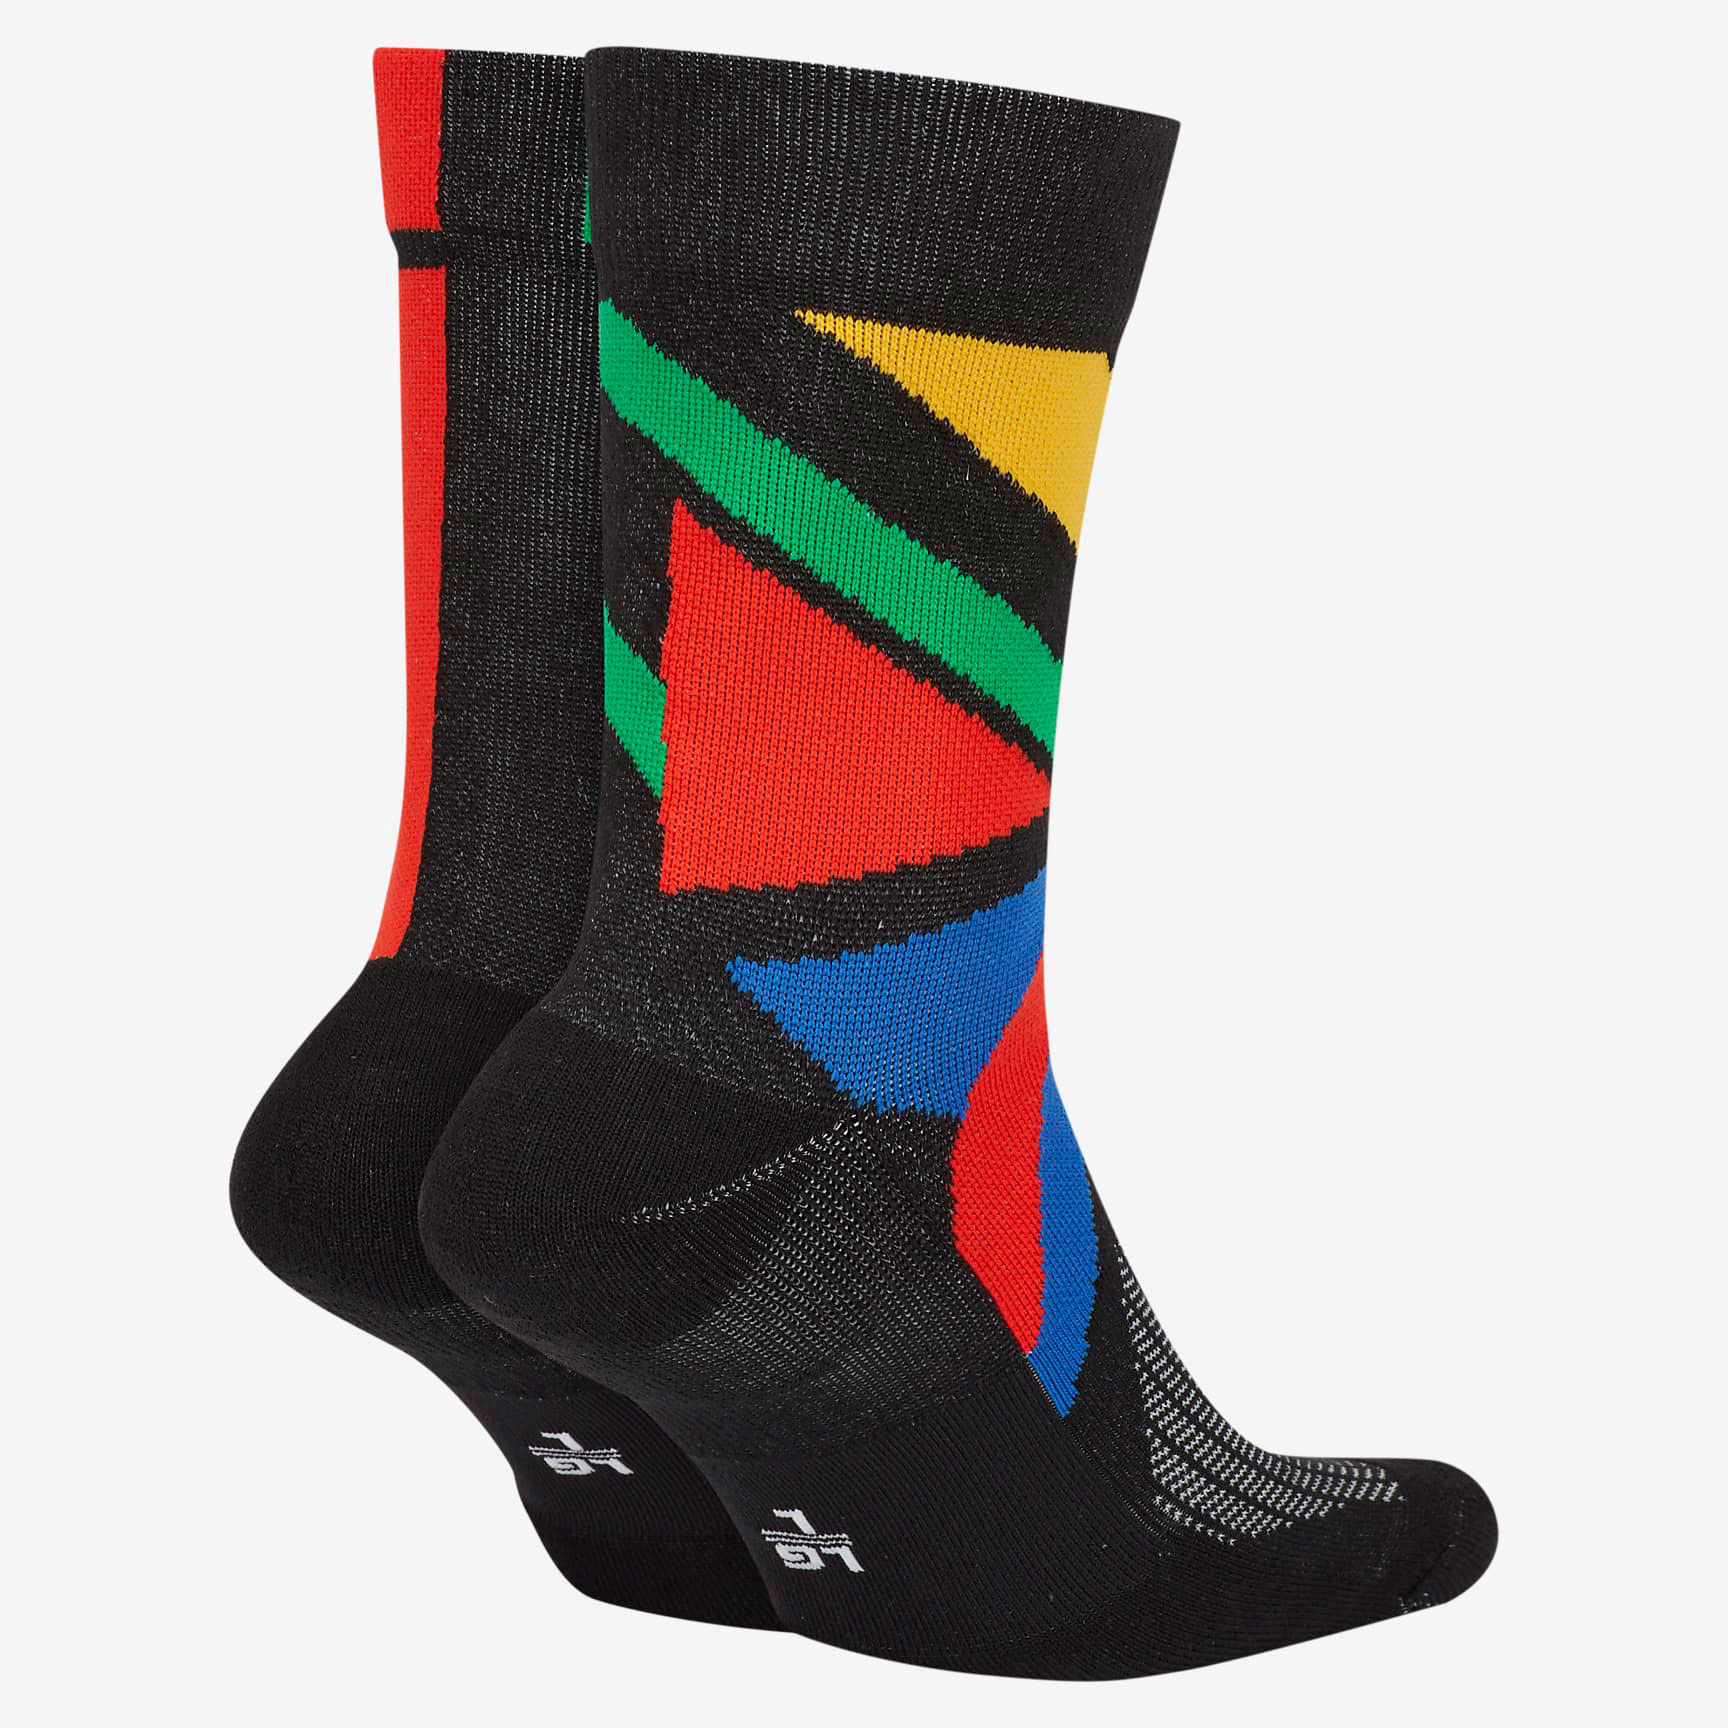 nike-urban-jungle-live-together-play-together-socks-2